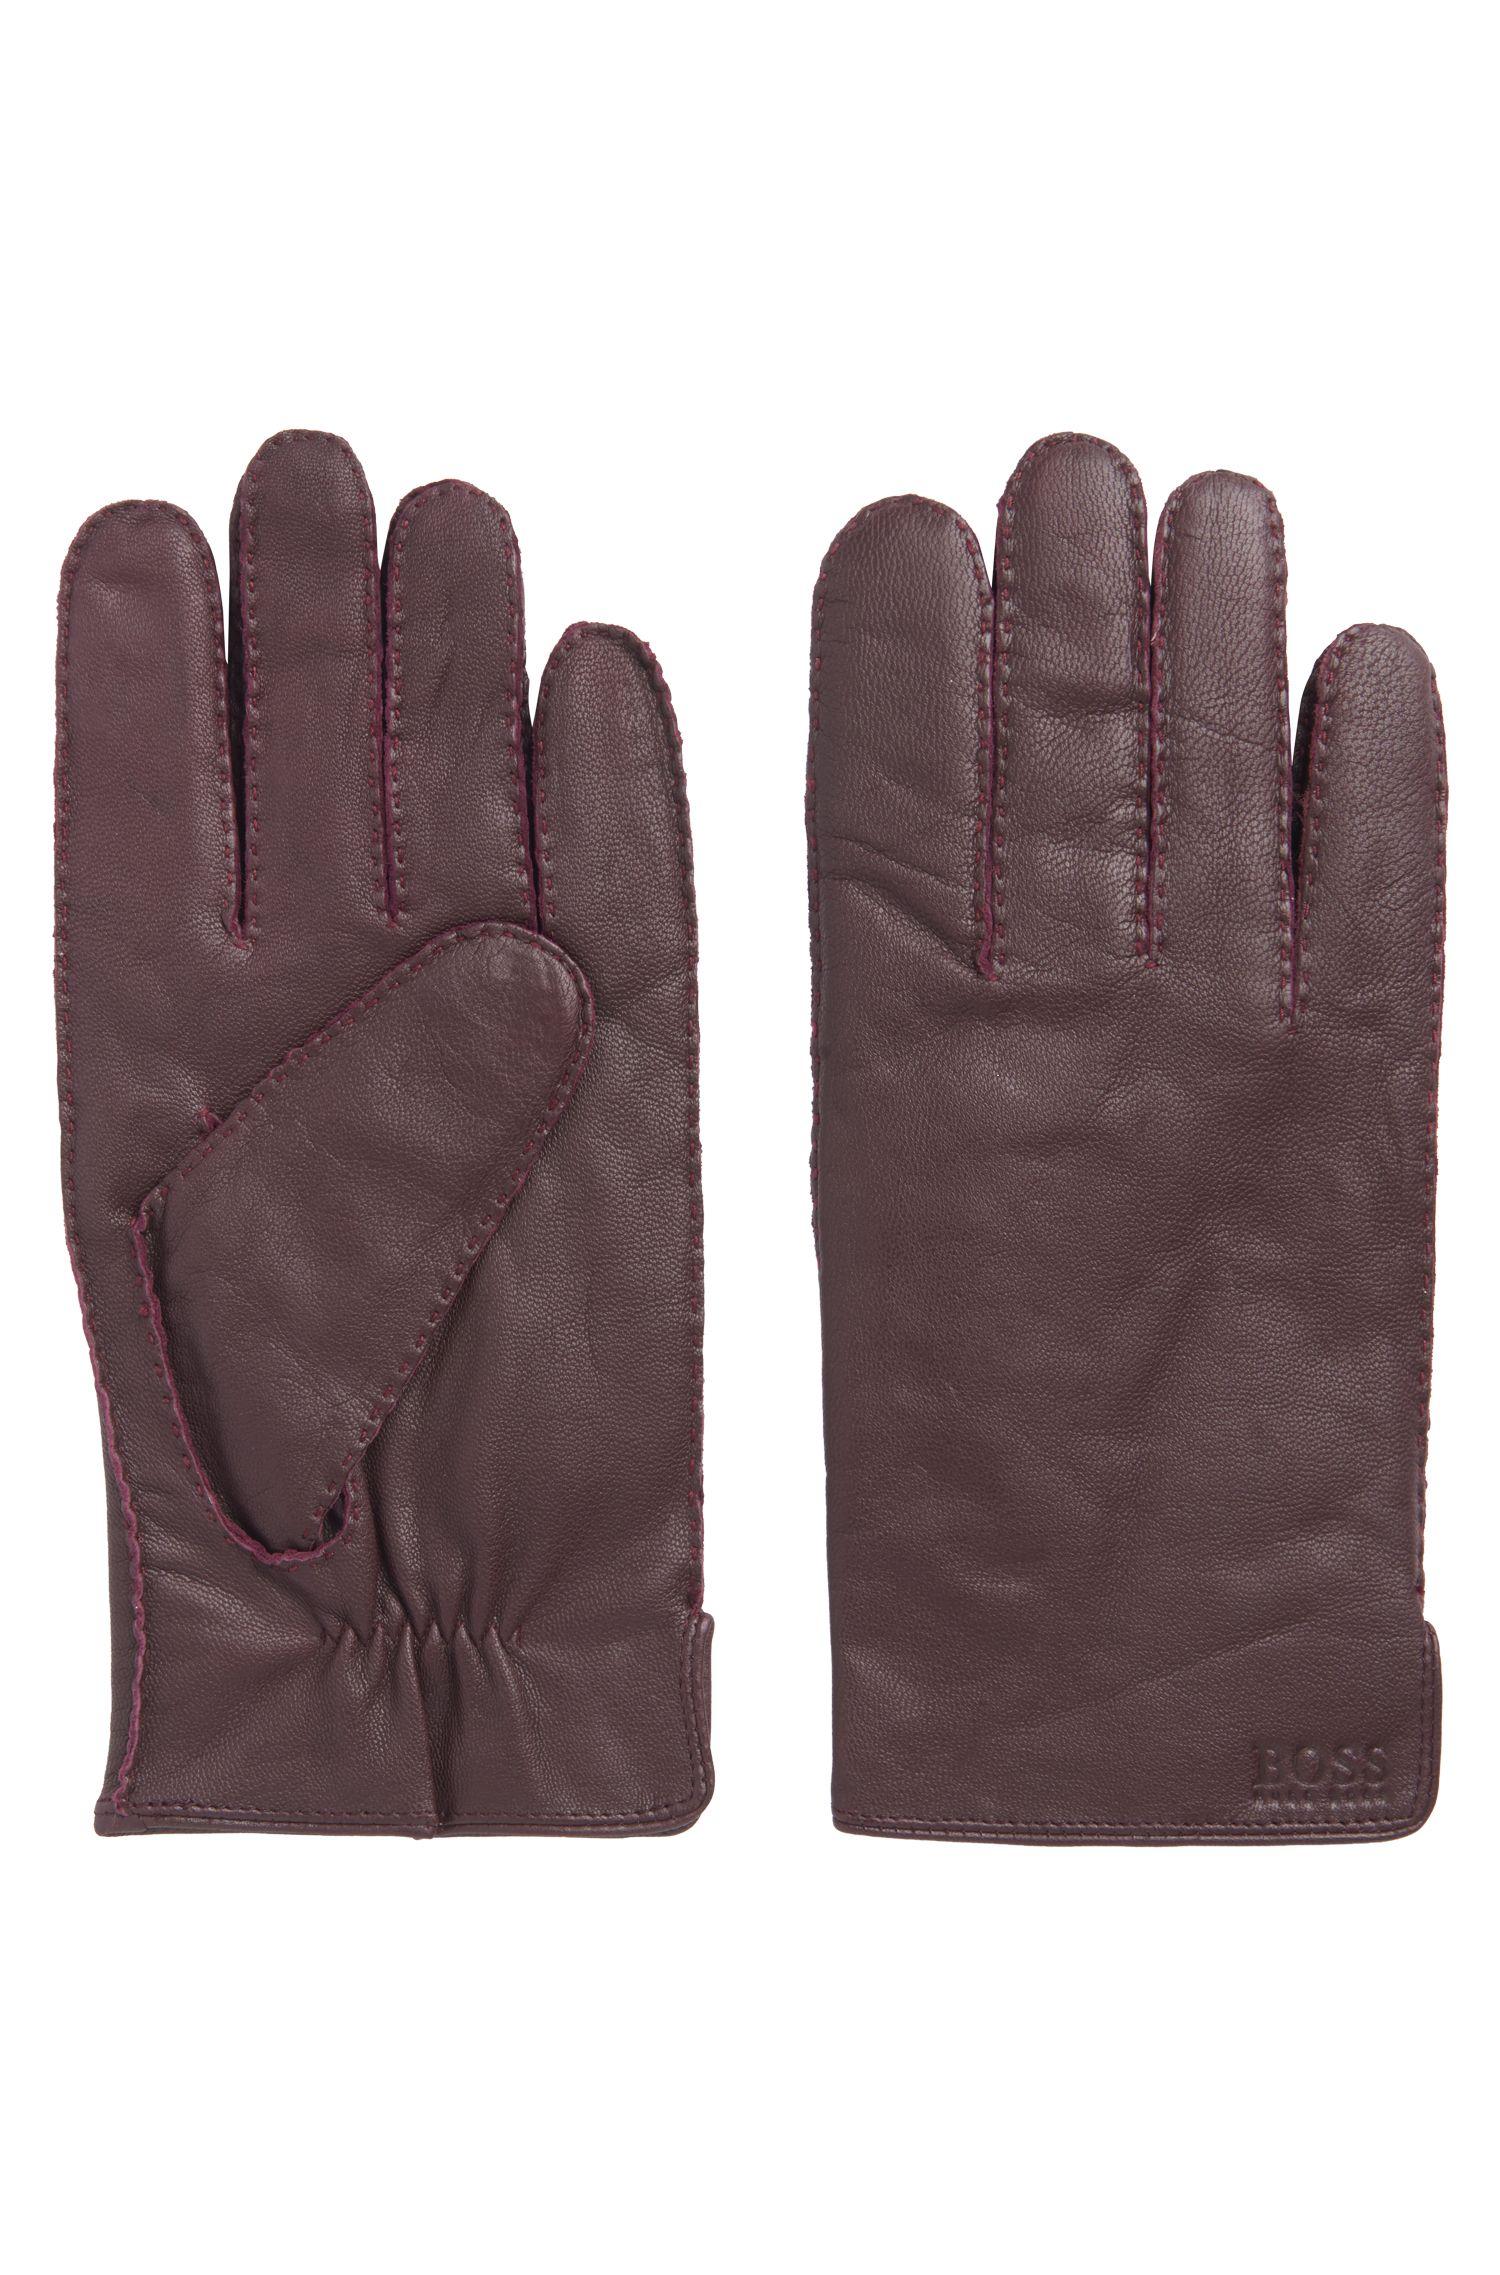 Nappa Leather Gloves | Kranton